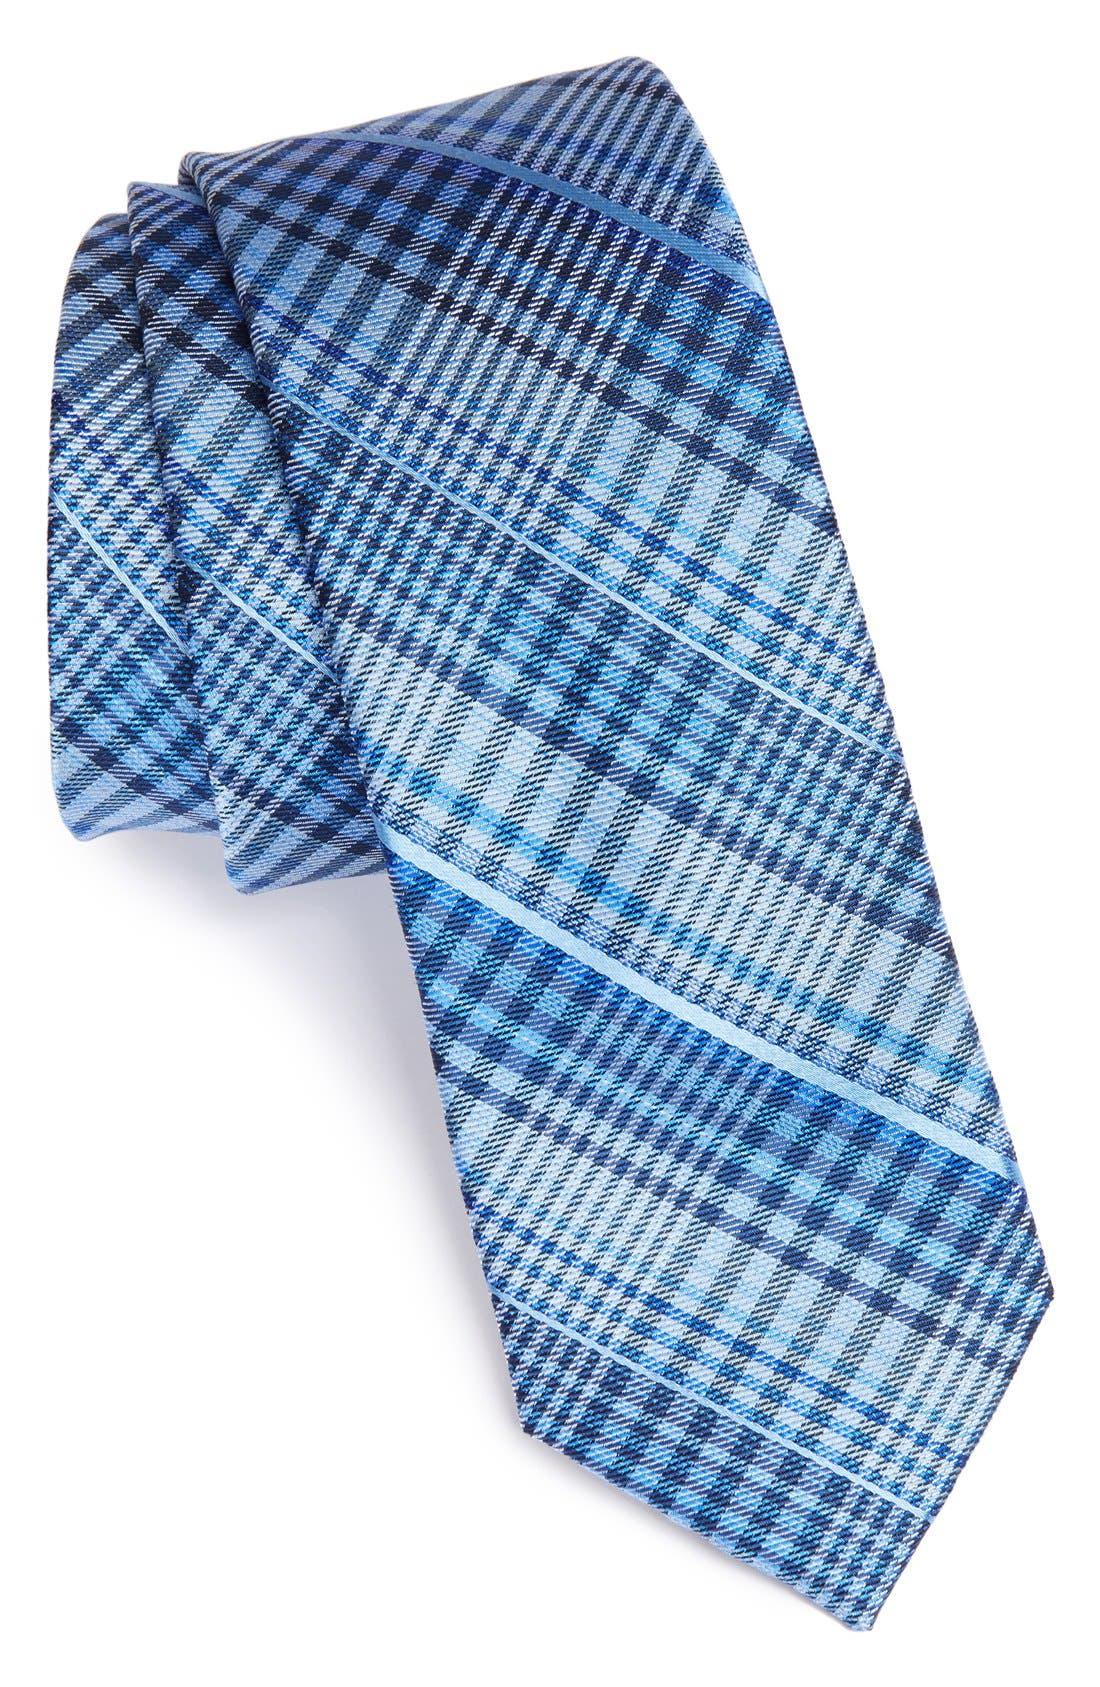 Alternate Image 1 Selected - 1901 'Davis' Woven Silk Tie